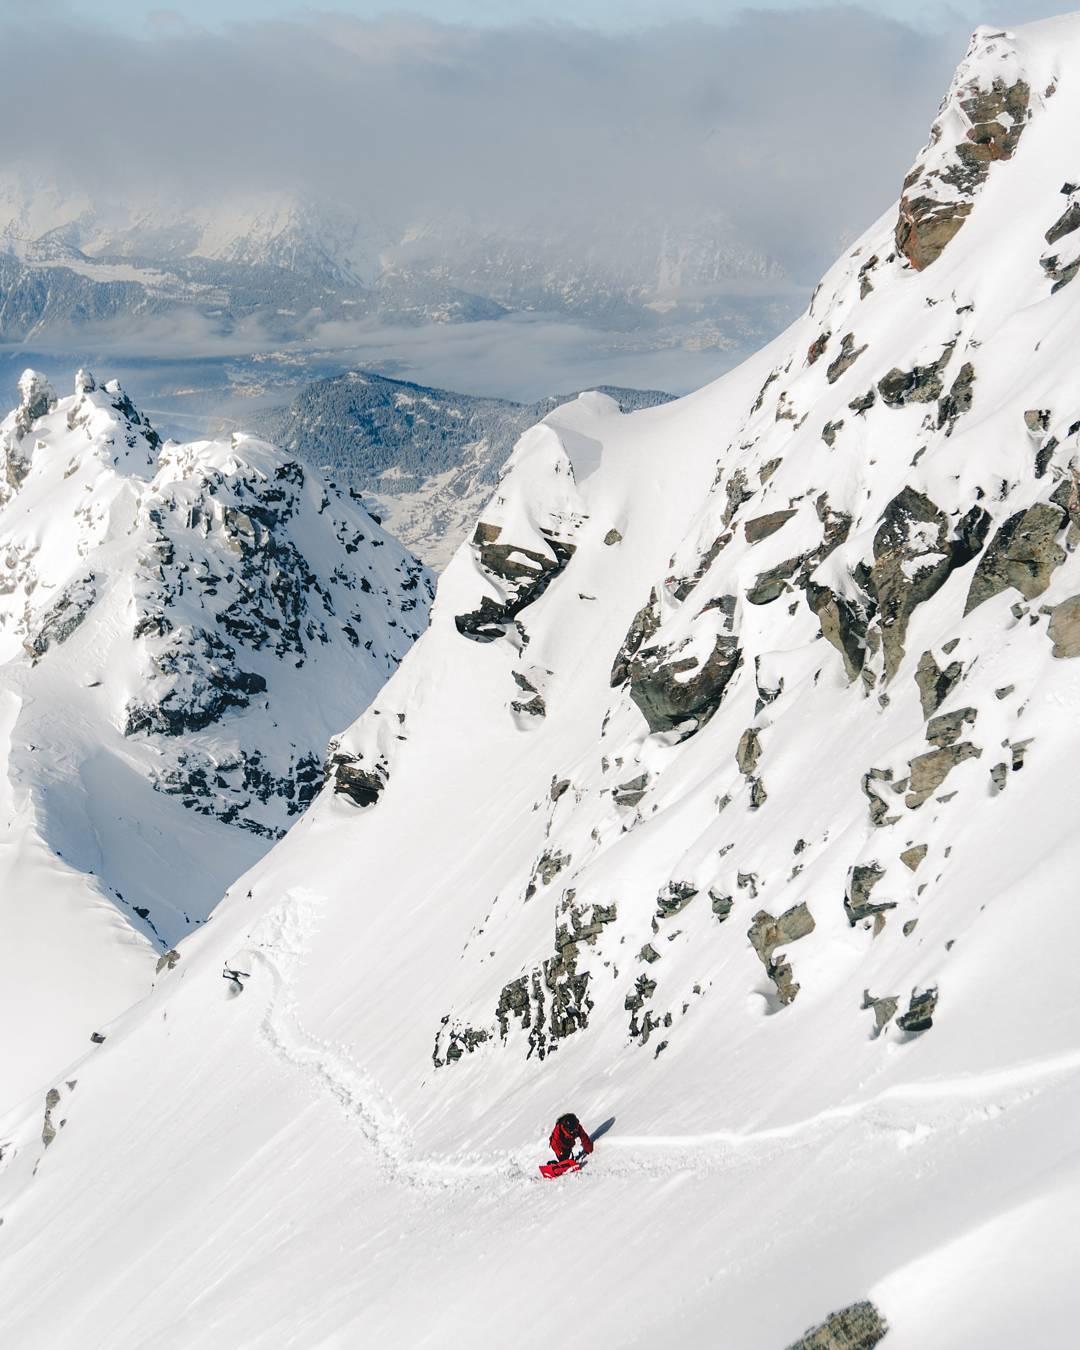 @johnhorsfall Snowfall in the Alps this week